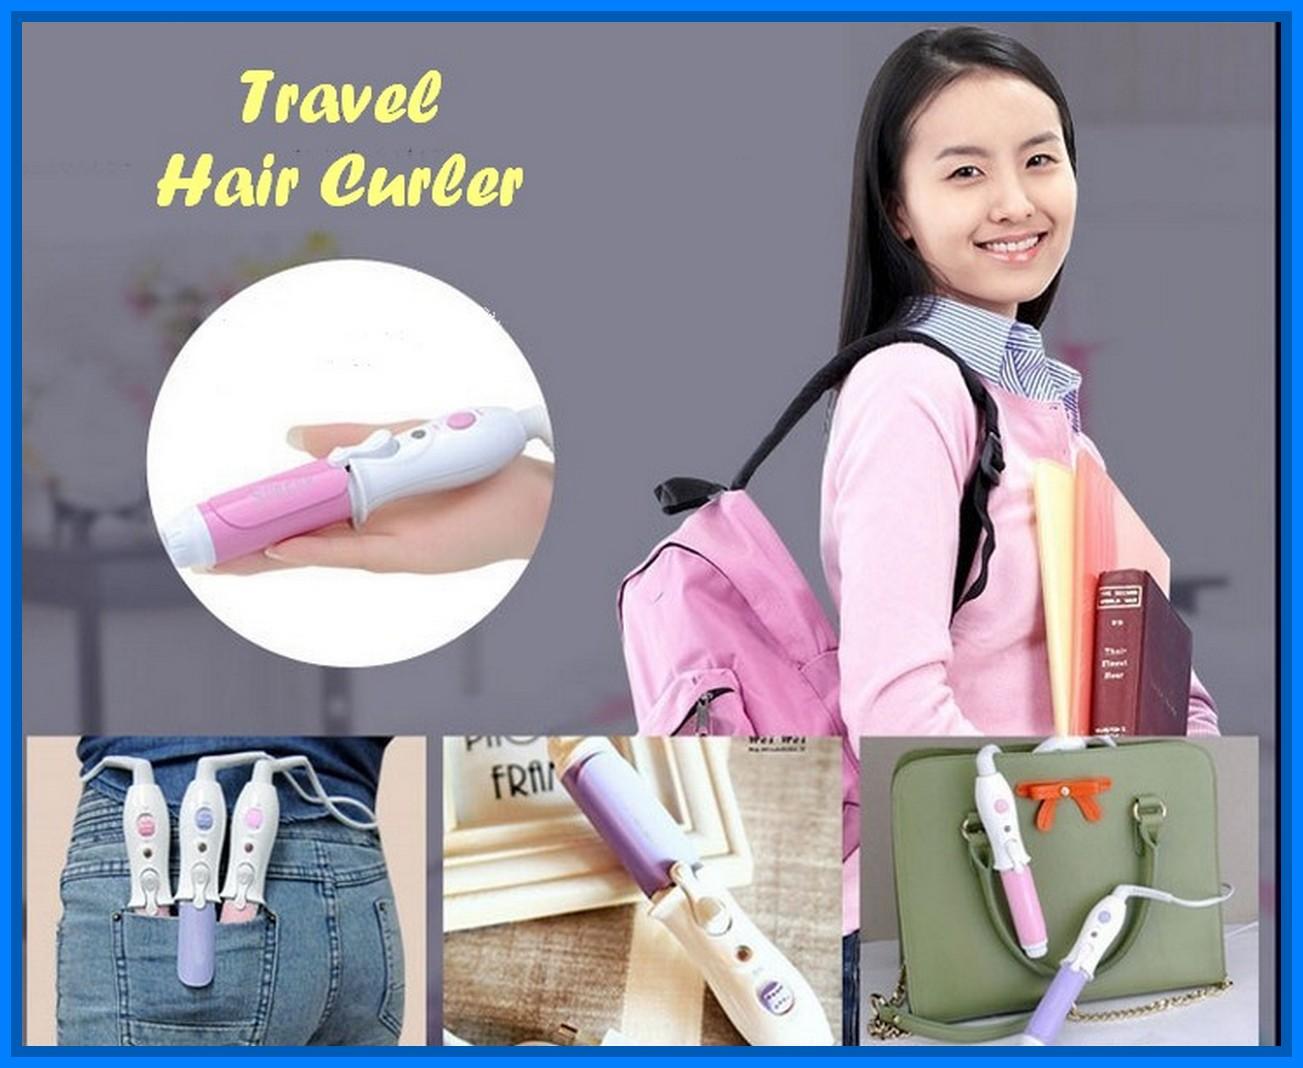 Travel Hair Curler Catokan Mini Mudah Dibawa Berpergian Ada On Off Olshop Fashion Produk Kecantikan Di Carousell